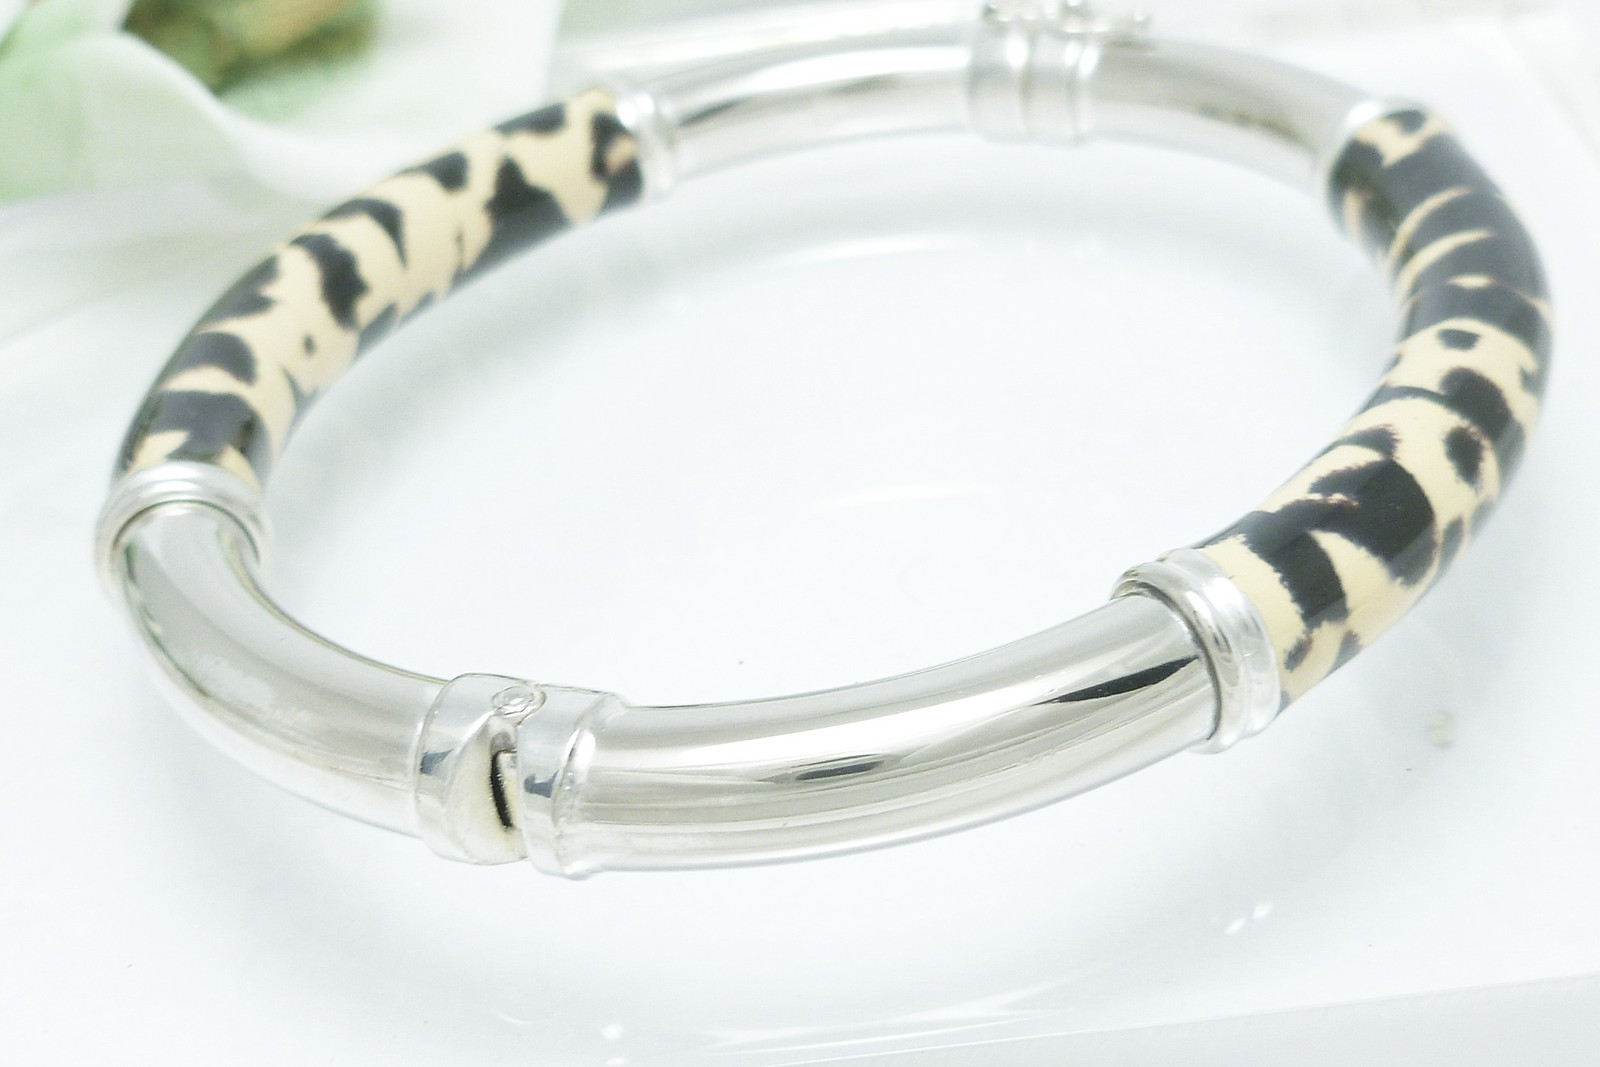 Sterling Enamel Animal Print Hinged Bangle Bracelet Average Wrist Size 7 inch